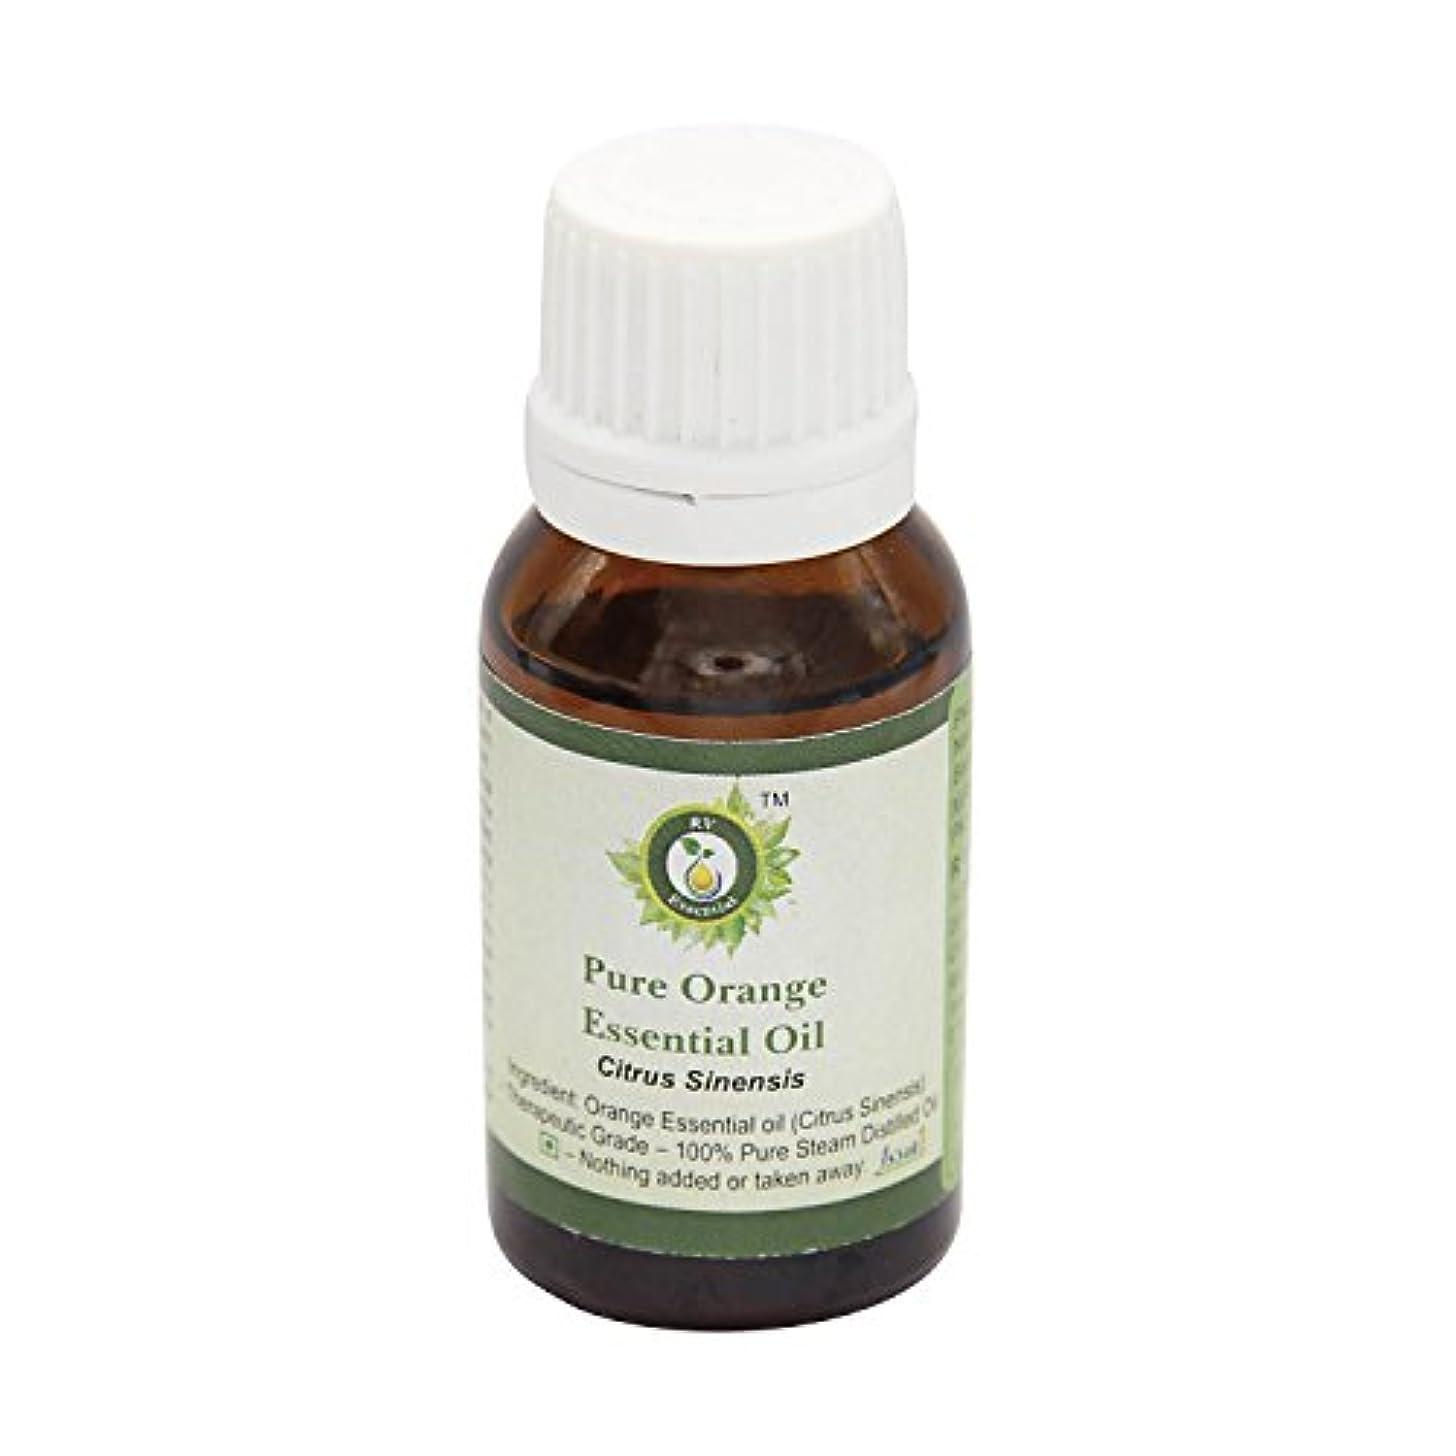 R V Essential ピュアオレンジエッセンシャルオイル30ml (1.01oz)- Citrus Sinensis (100%純粋&天然スチームDistilled) Pure Orange Essential Oil